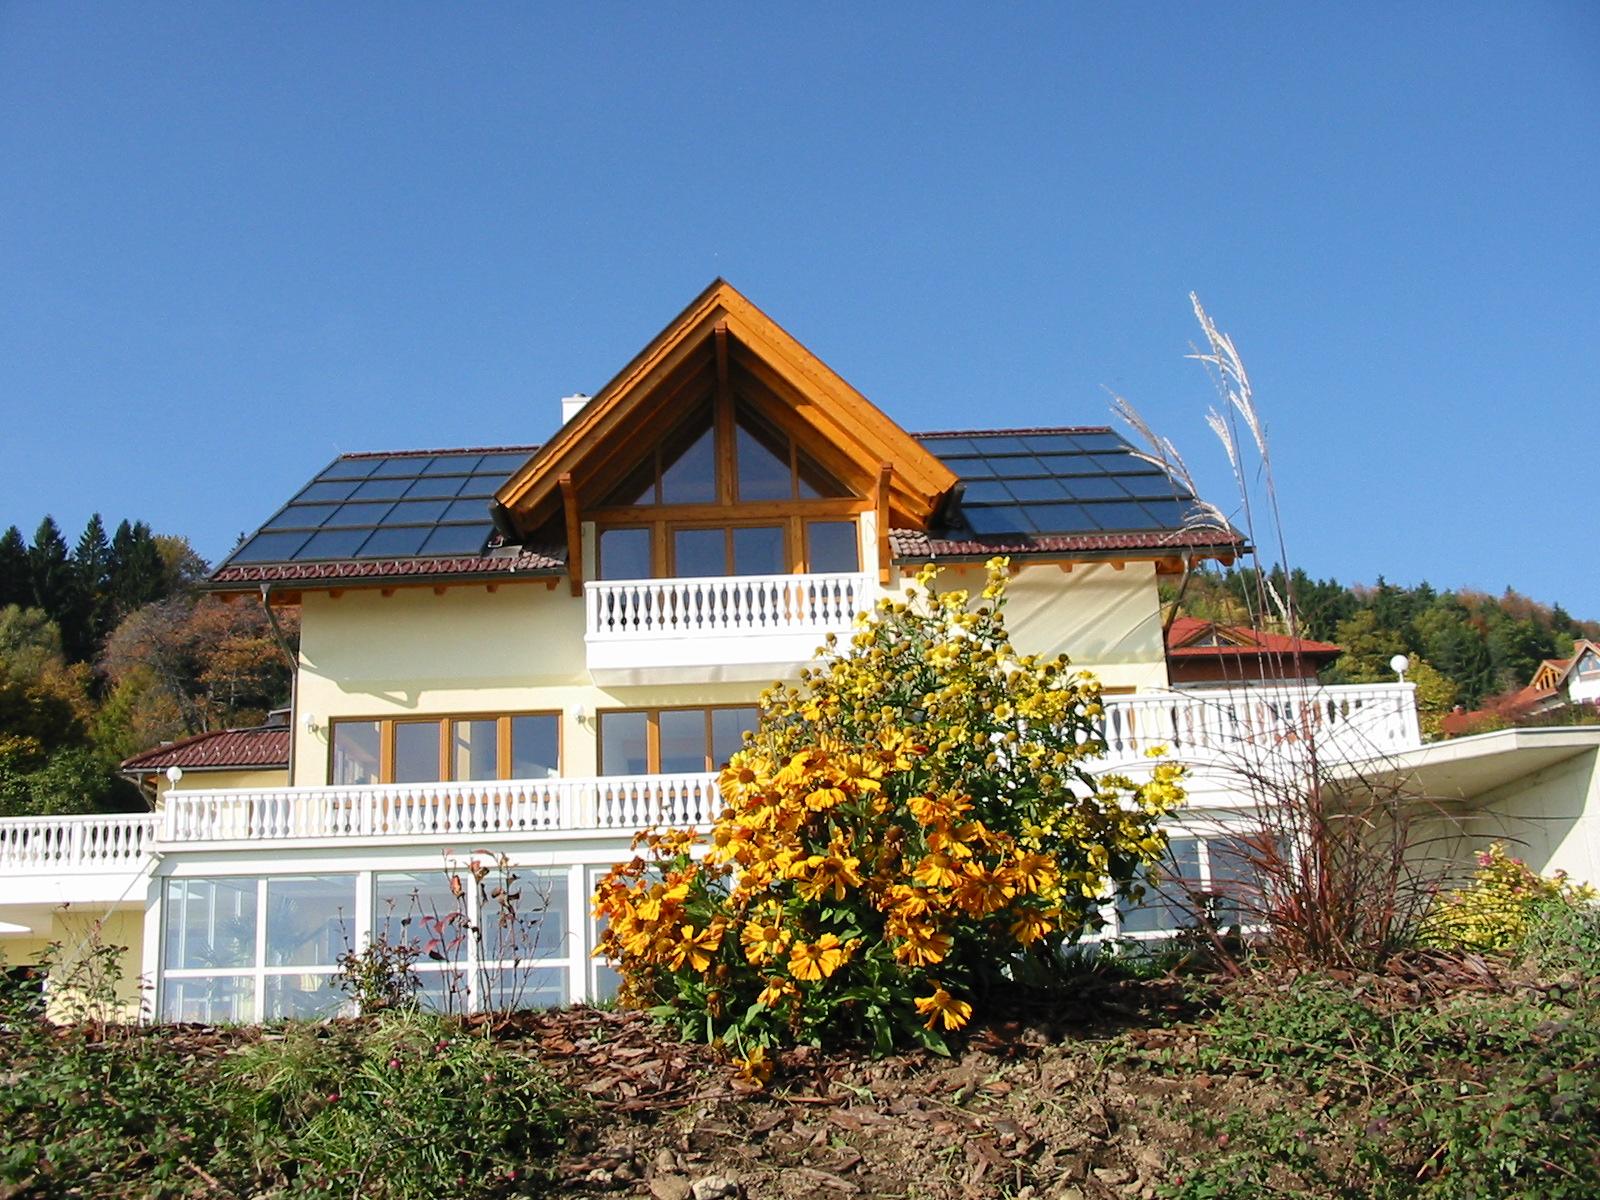 Haus mit Solaranlage - MacTherm